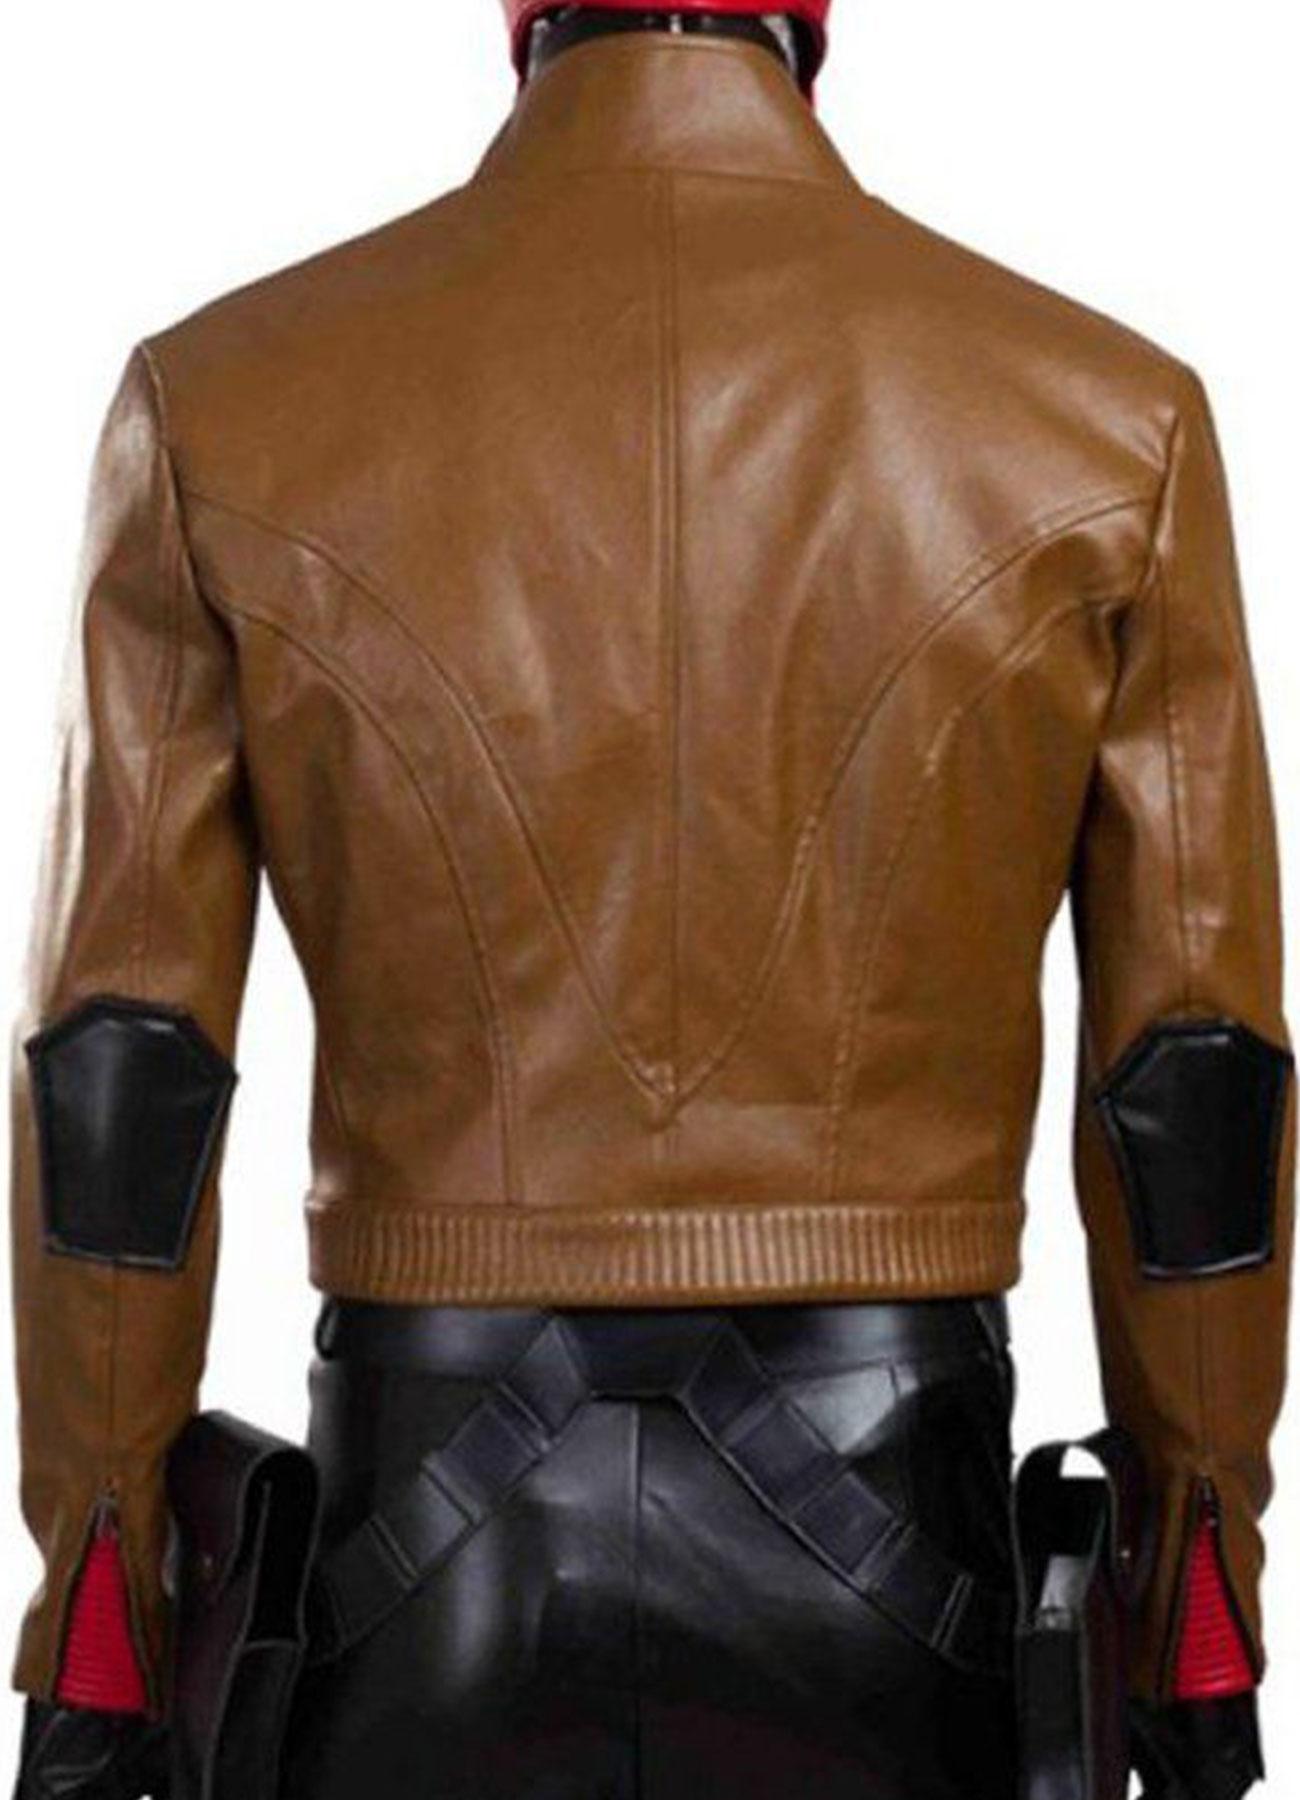 Jason Todd - Batman Under The Red Hood Biker Sheepskin Leather Jacket